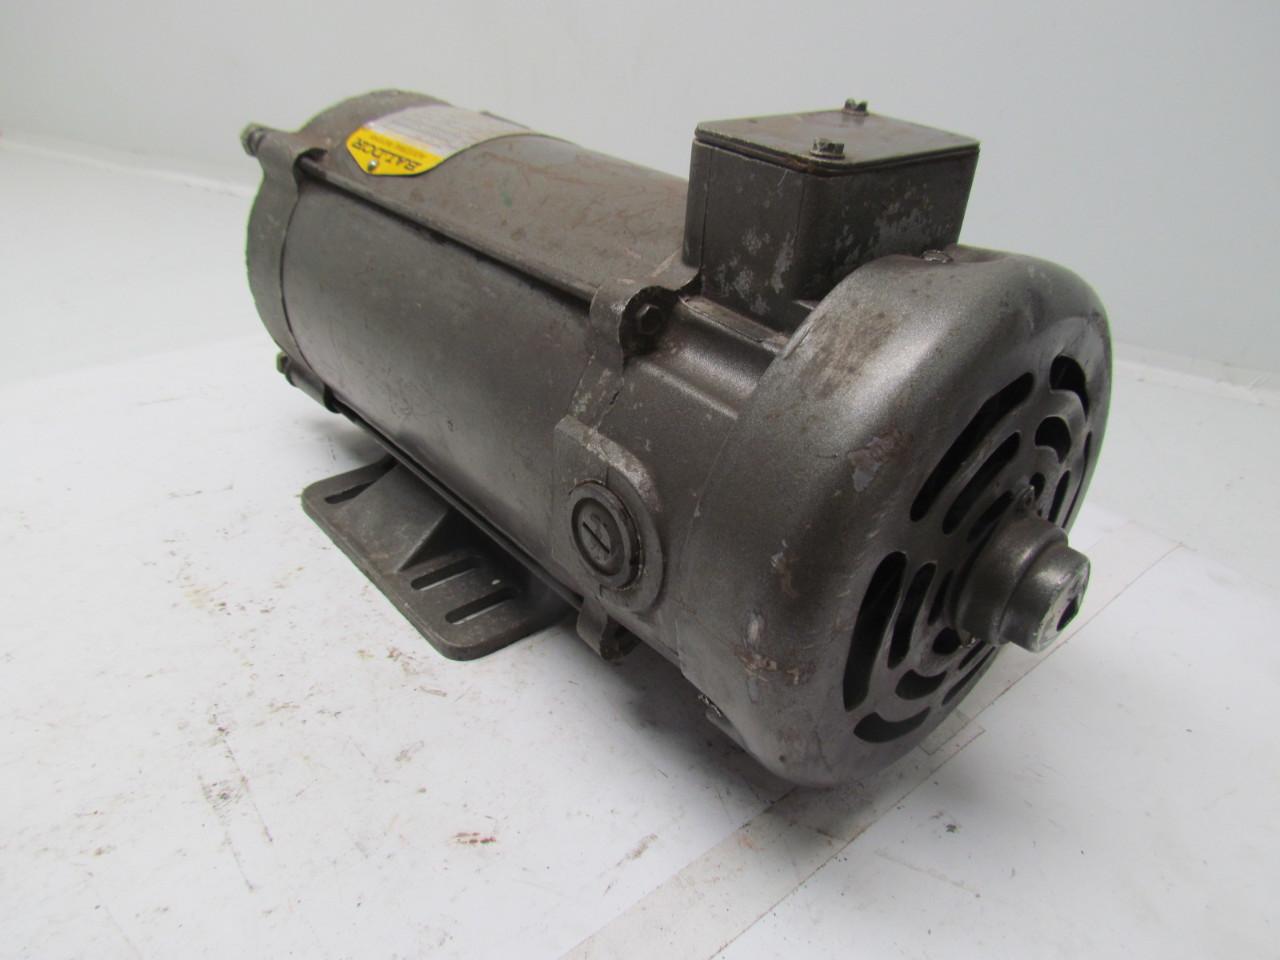 Baldor cdp3455 dc motor 1hp 180v 5a 1750rpm frame 56c ebay for 56c frame motor dimensions